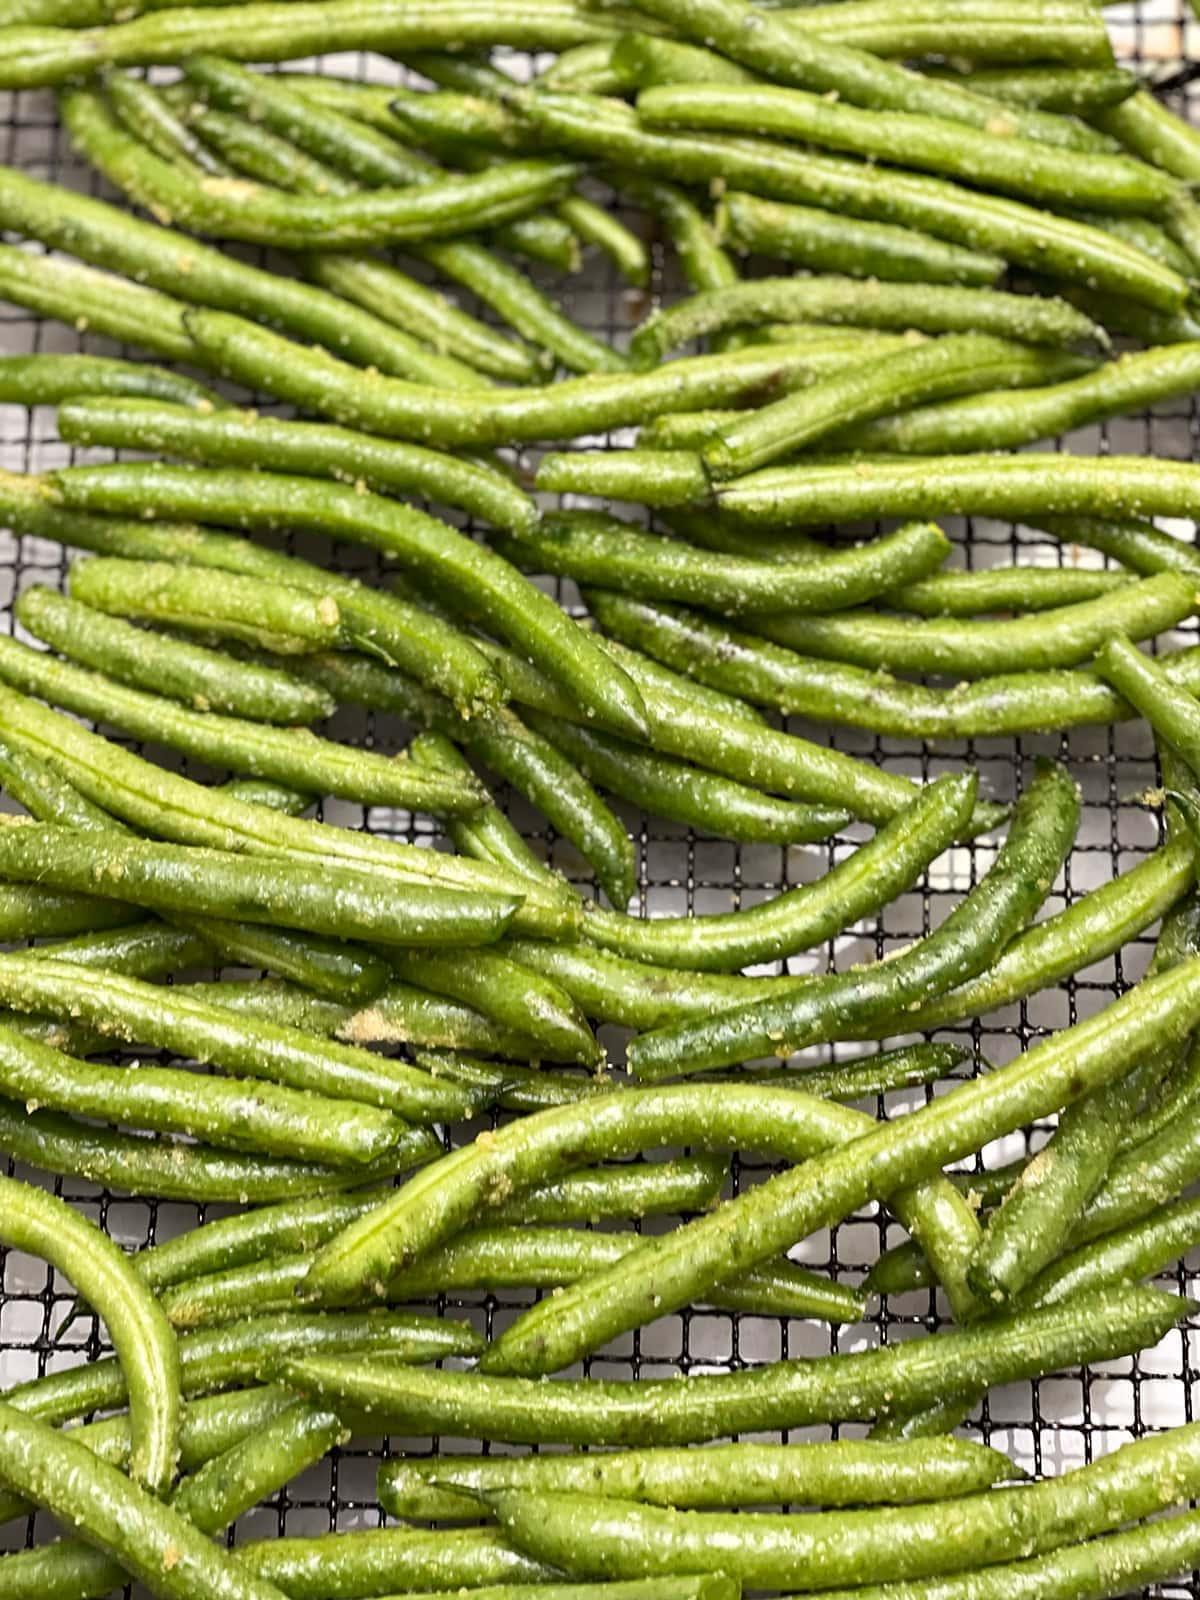 green beans on air fryer basket